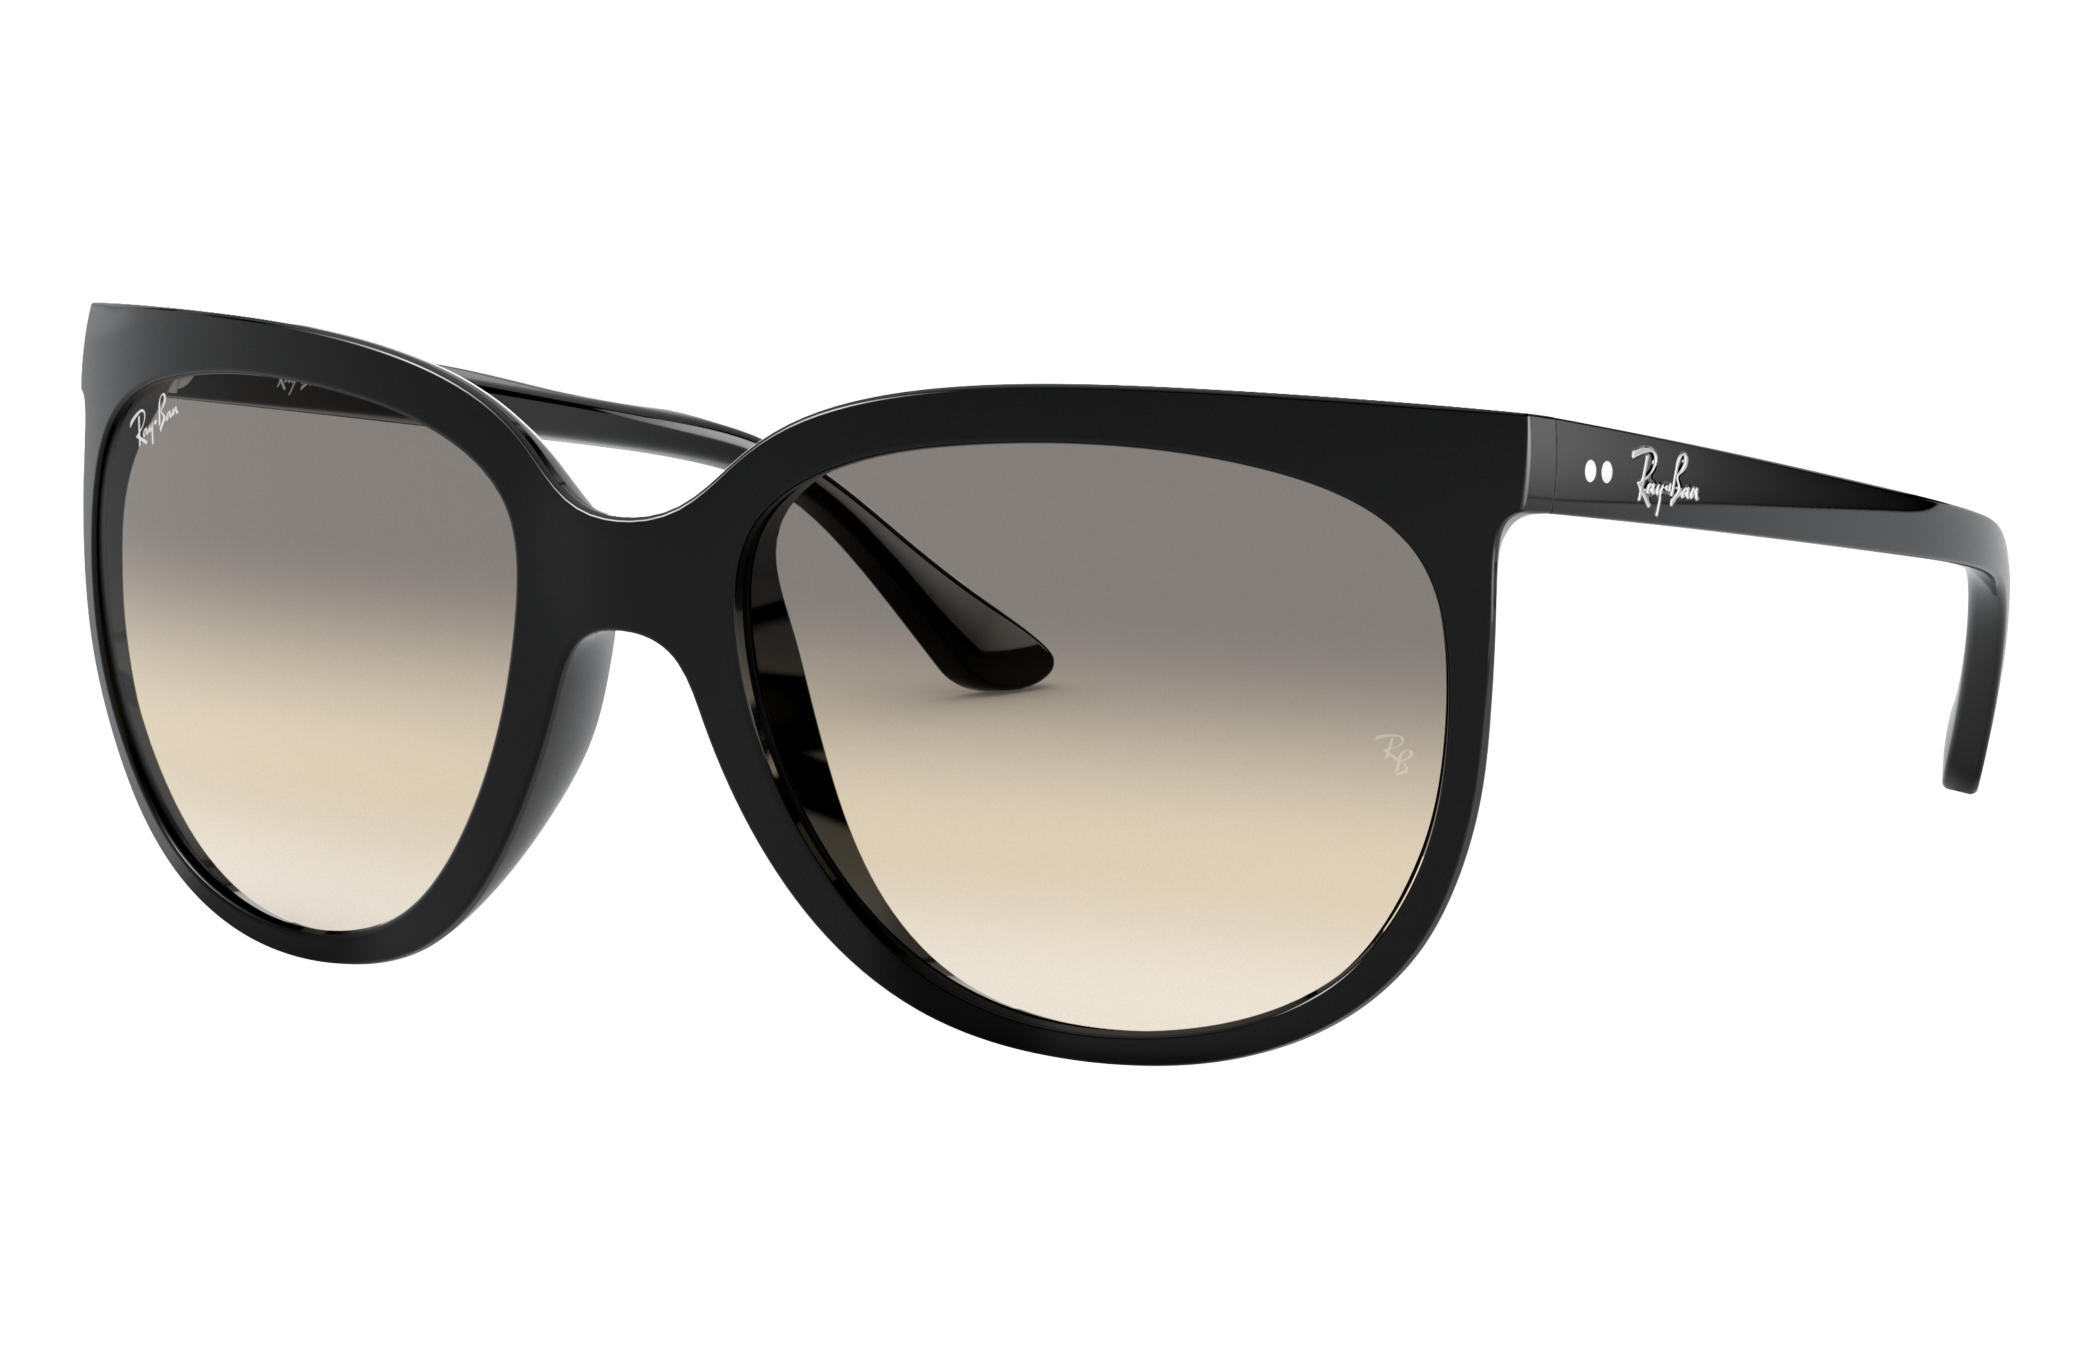 Ray-Ban Cats 1000 Black, Gray Lenses - RB4126